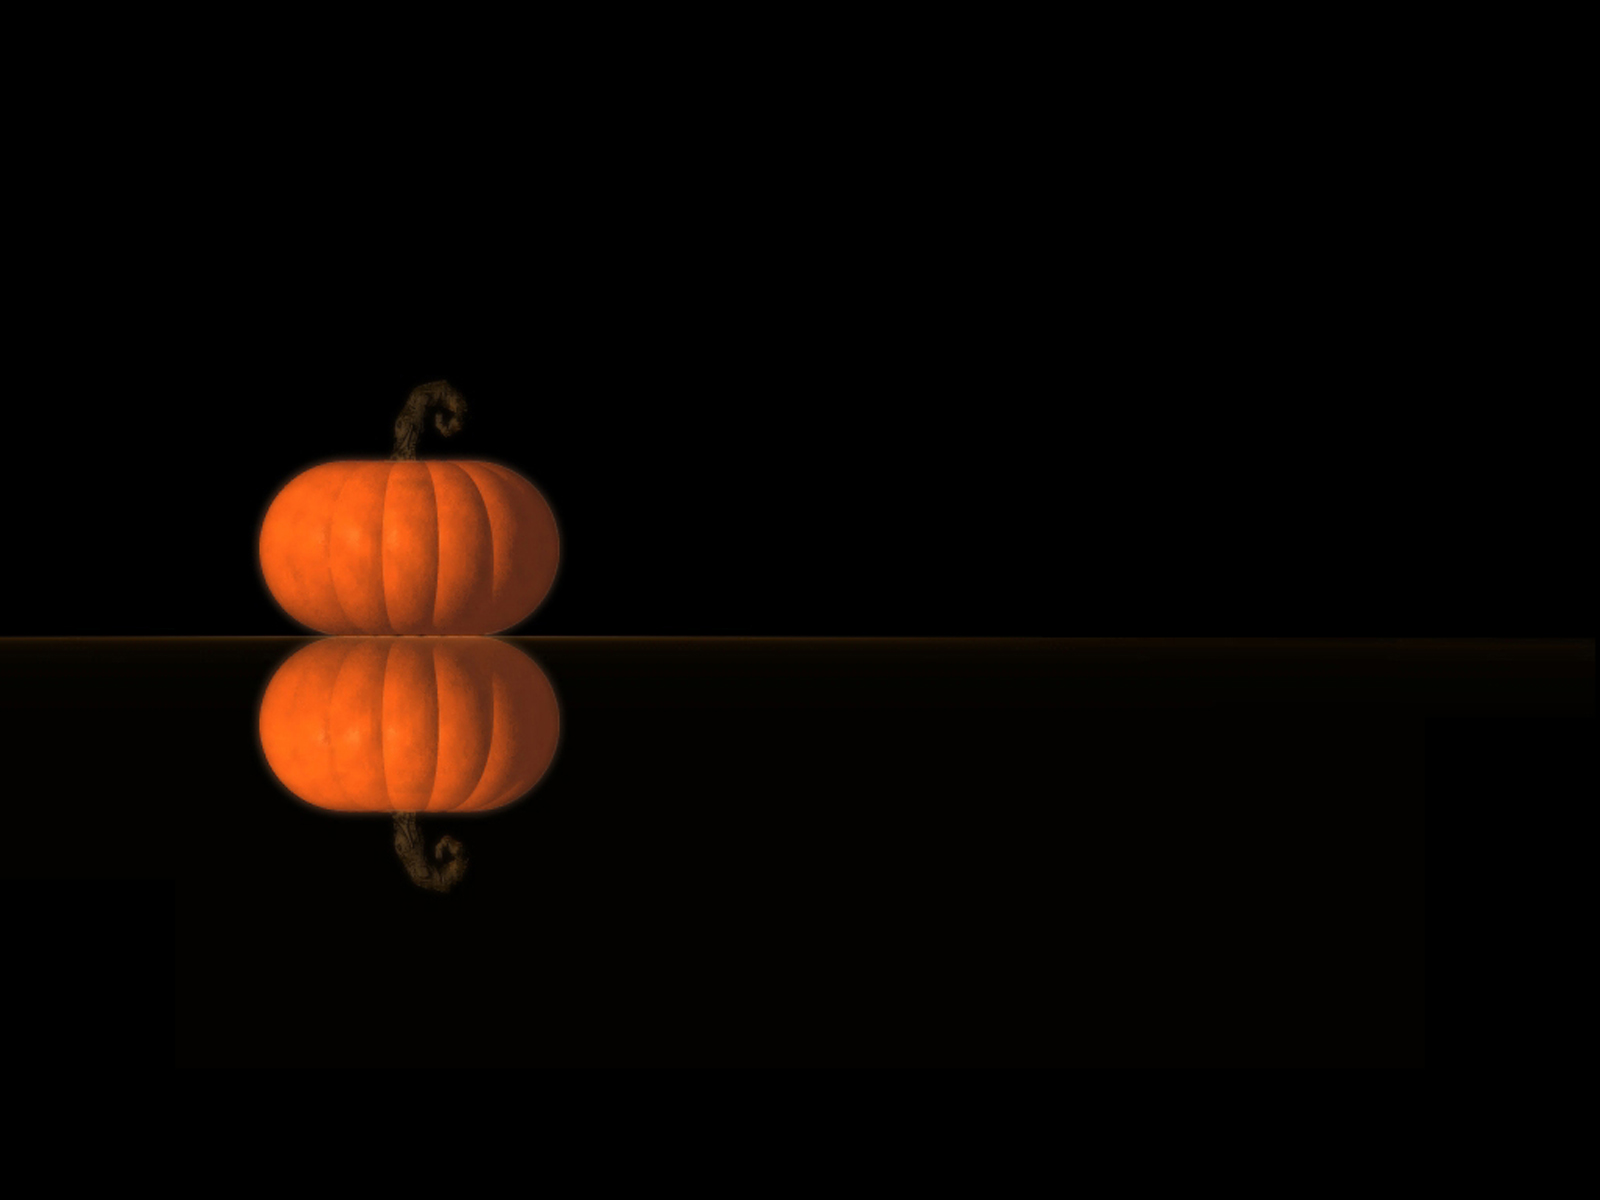 Halloween Screensavers For Iphone